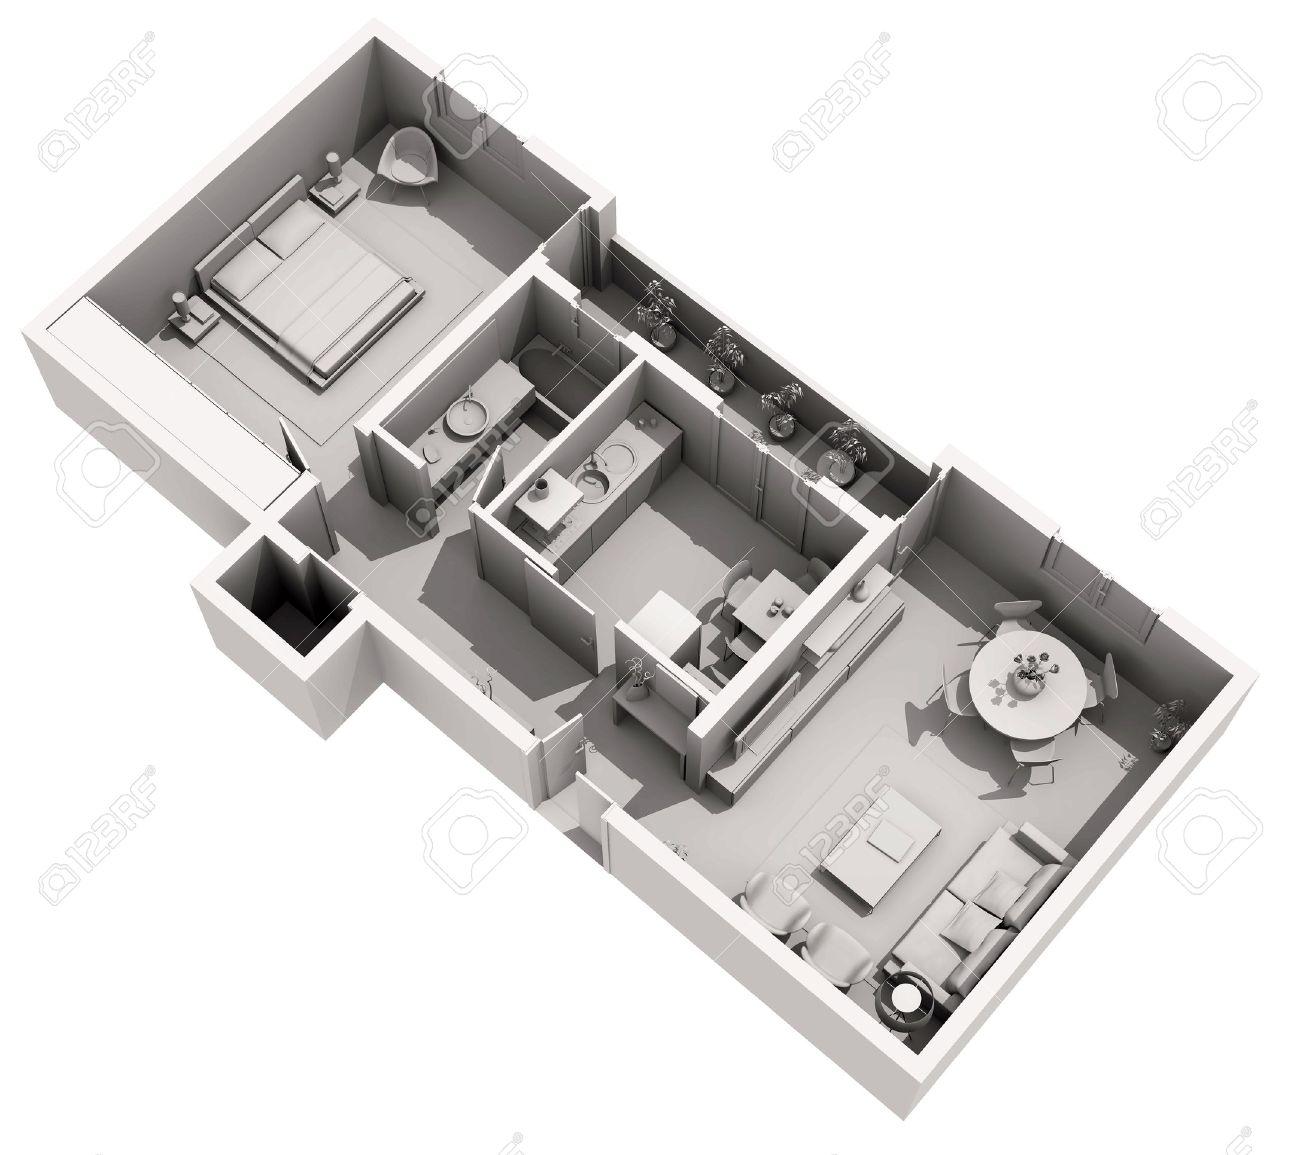 Interior design home projects - Modern Interior Design 3d Home Project Banco De Imagens 13615617